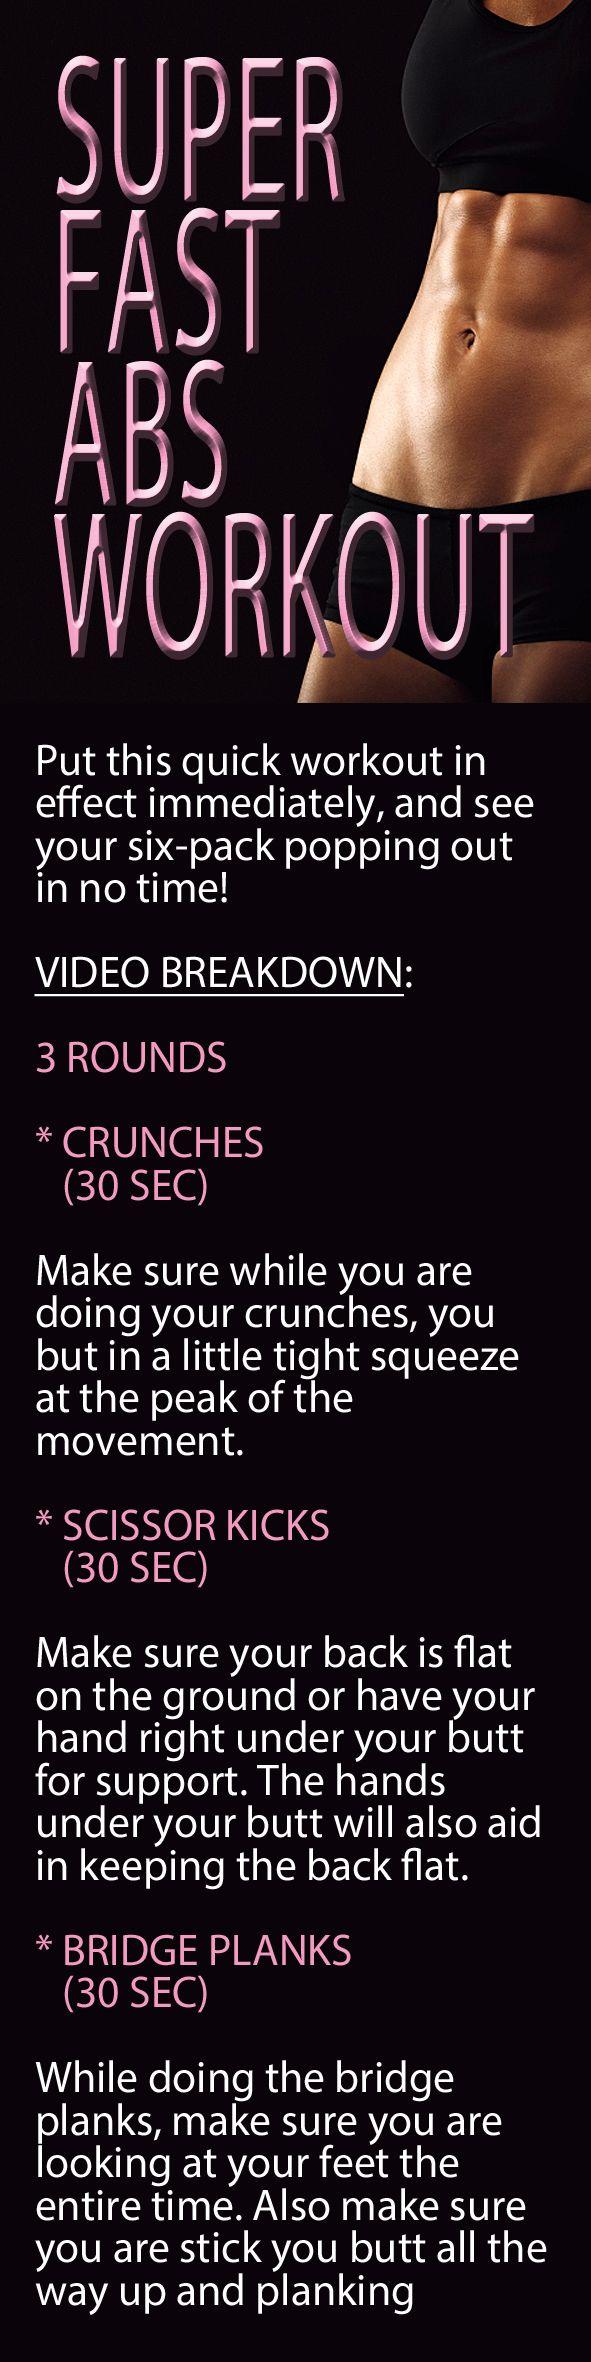 .Super fast abs workout. #abs #sixpack #flatstomach #flatbelly #coreworkout #abworkout #abworkout #sixpackworkout #bellyfat #muffintop #lovehandles